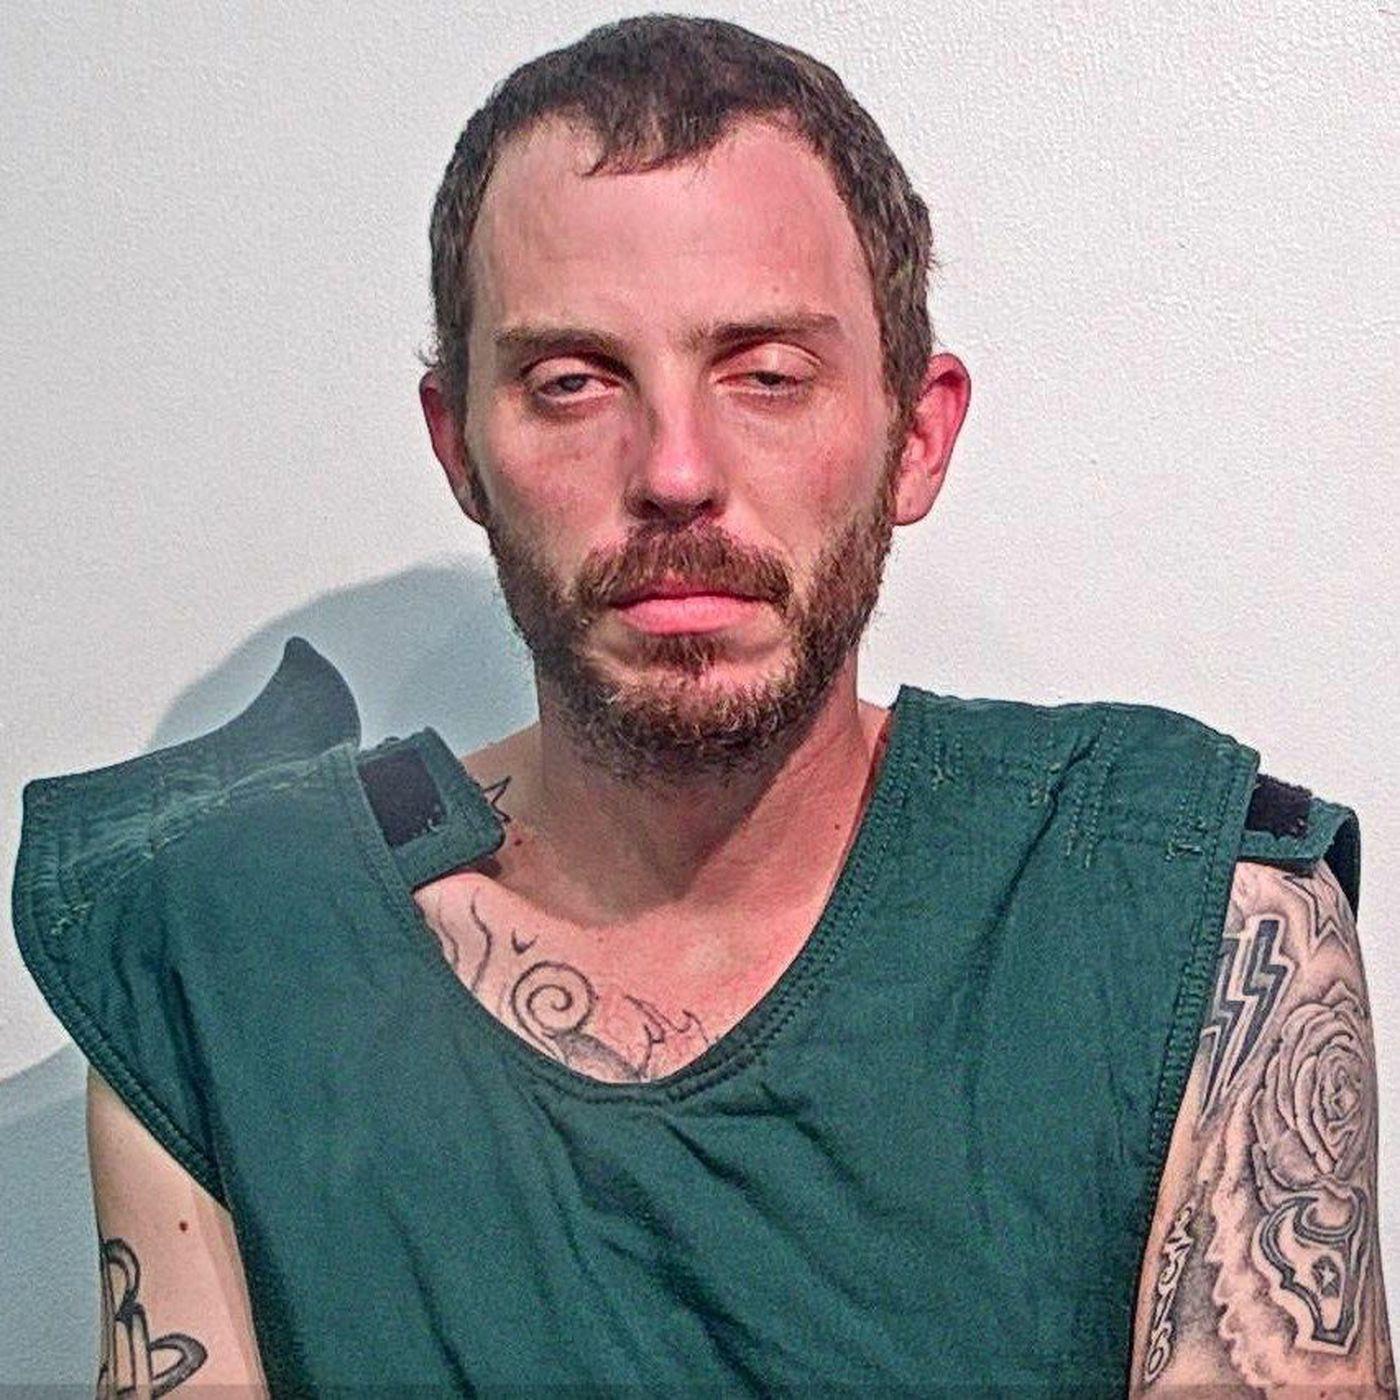 Traffic stop nets arrests, meth, other drugs, cash, fake $50